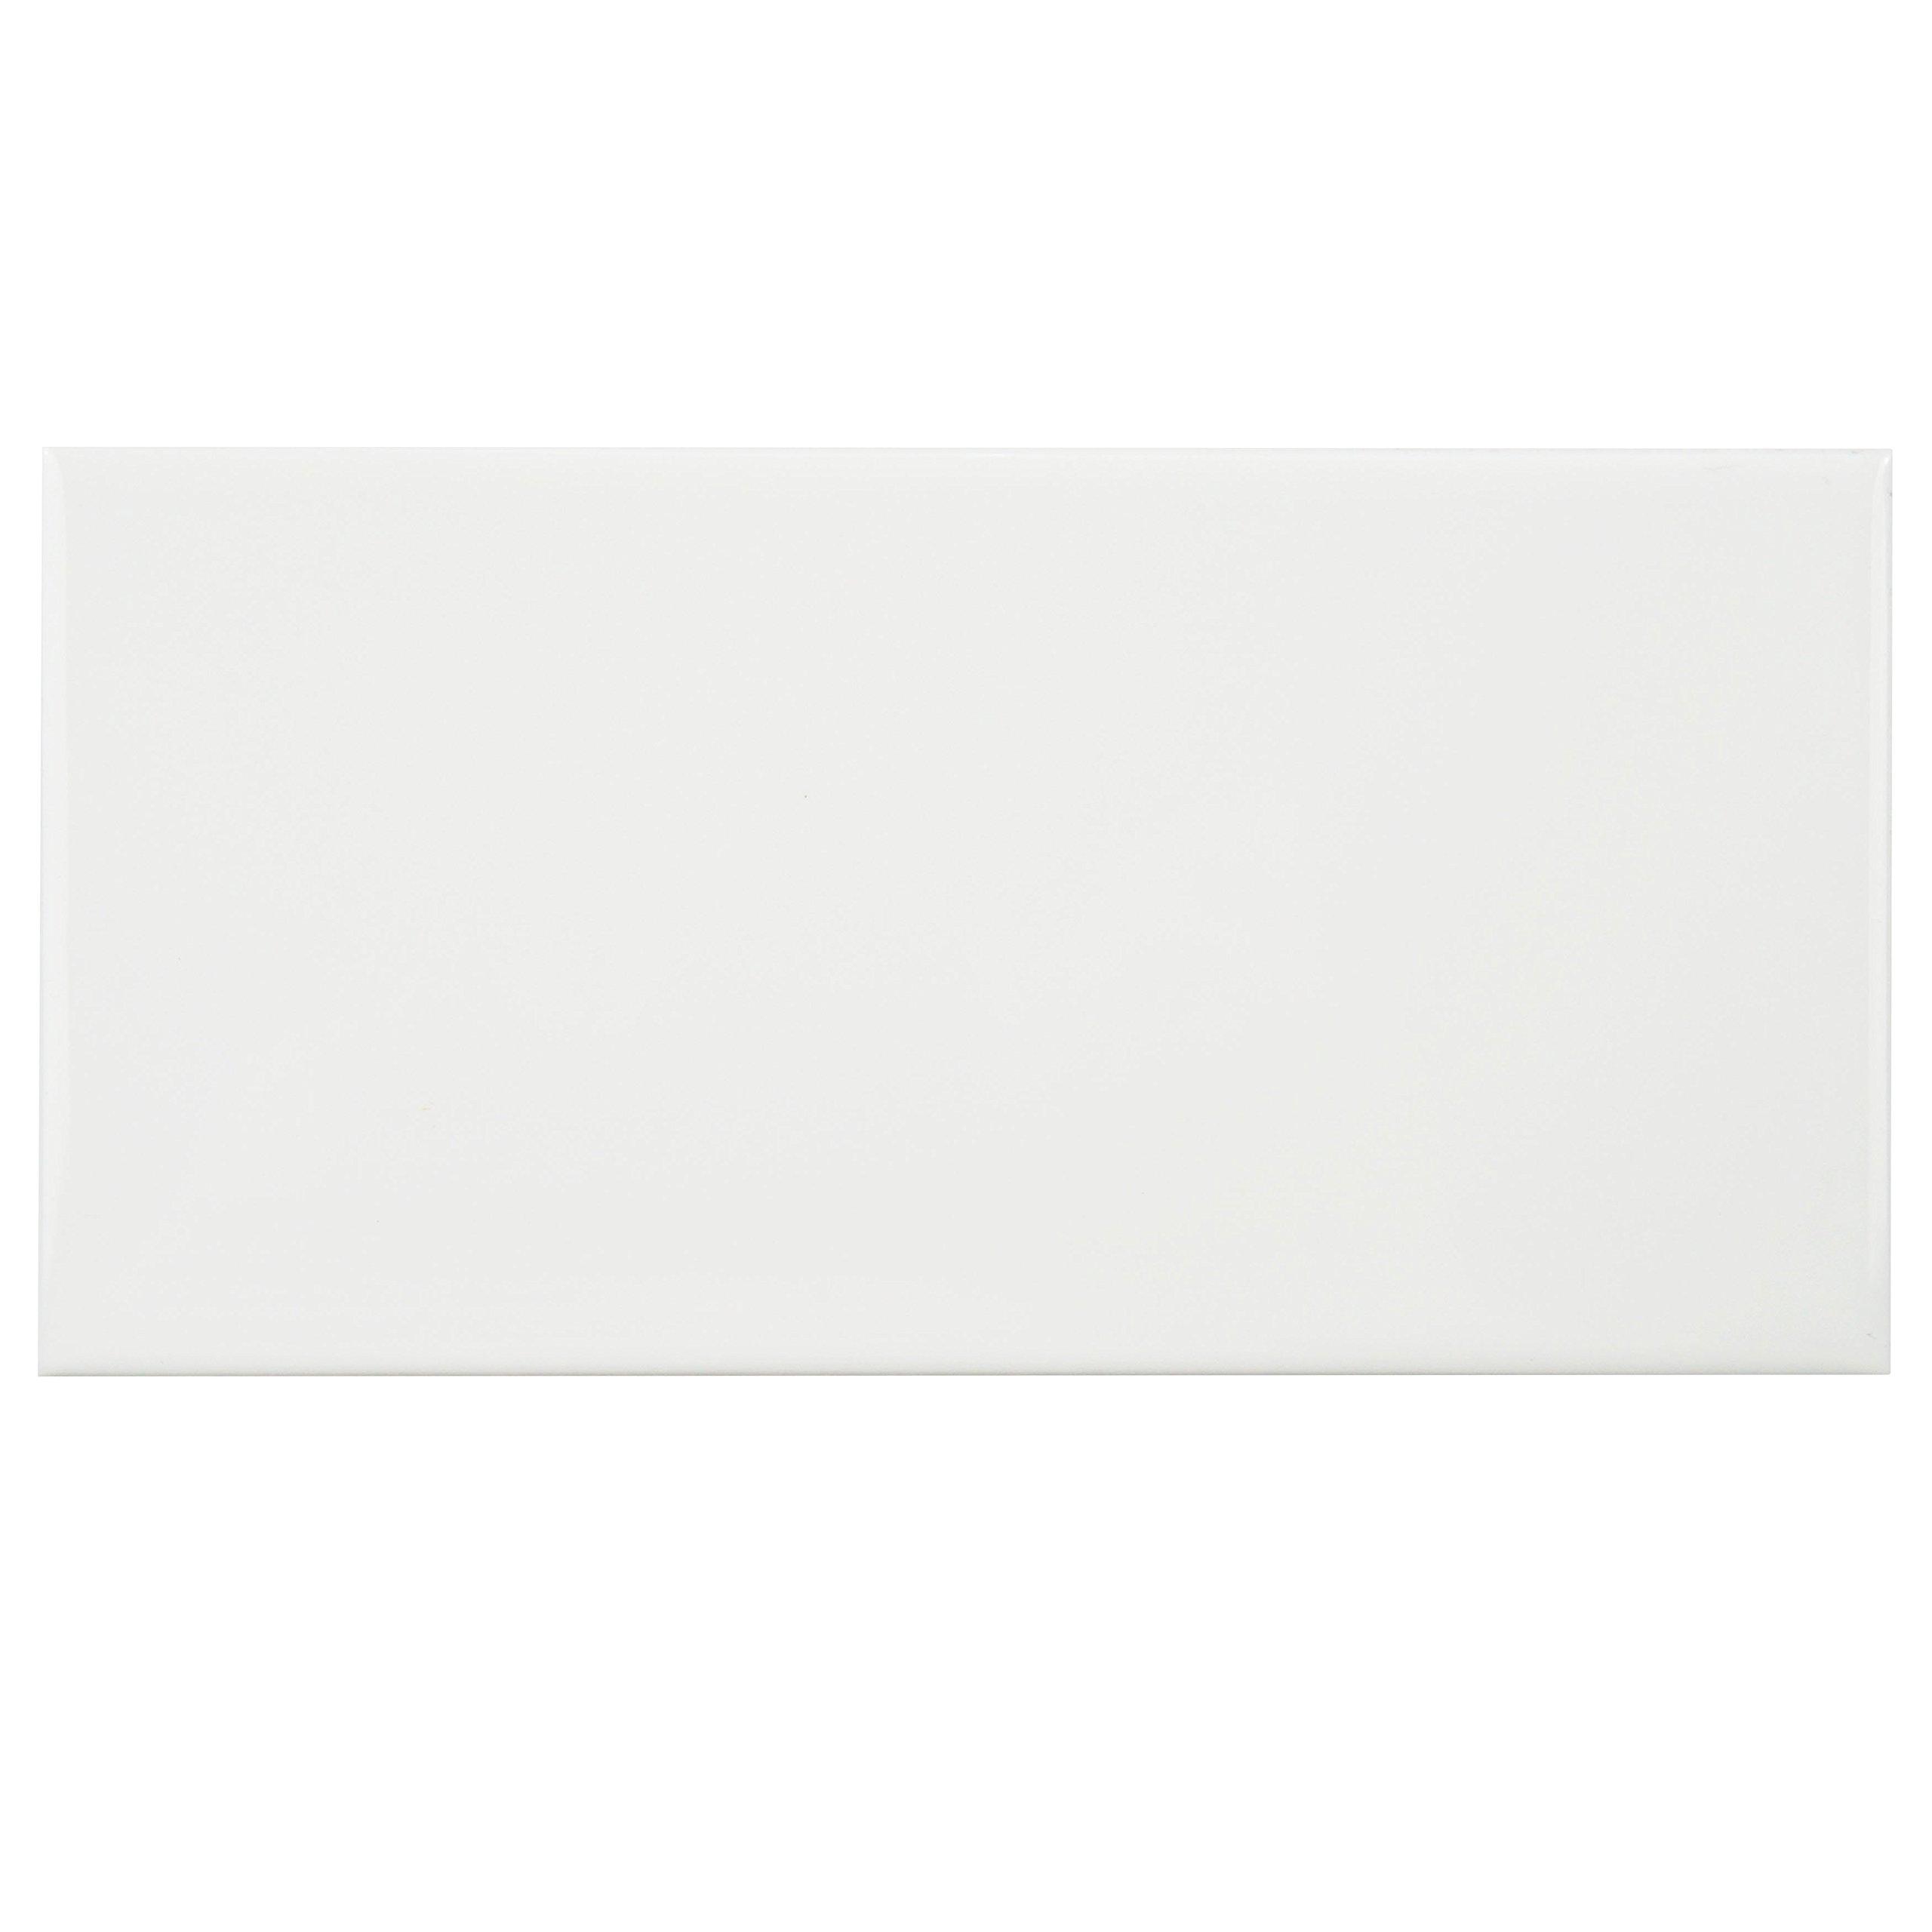 Cheap White Crackle Subway Tile Find White Crackle Subway Tile